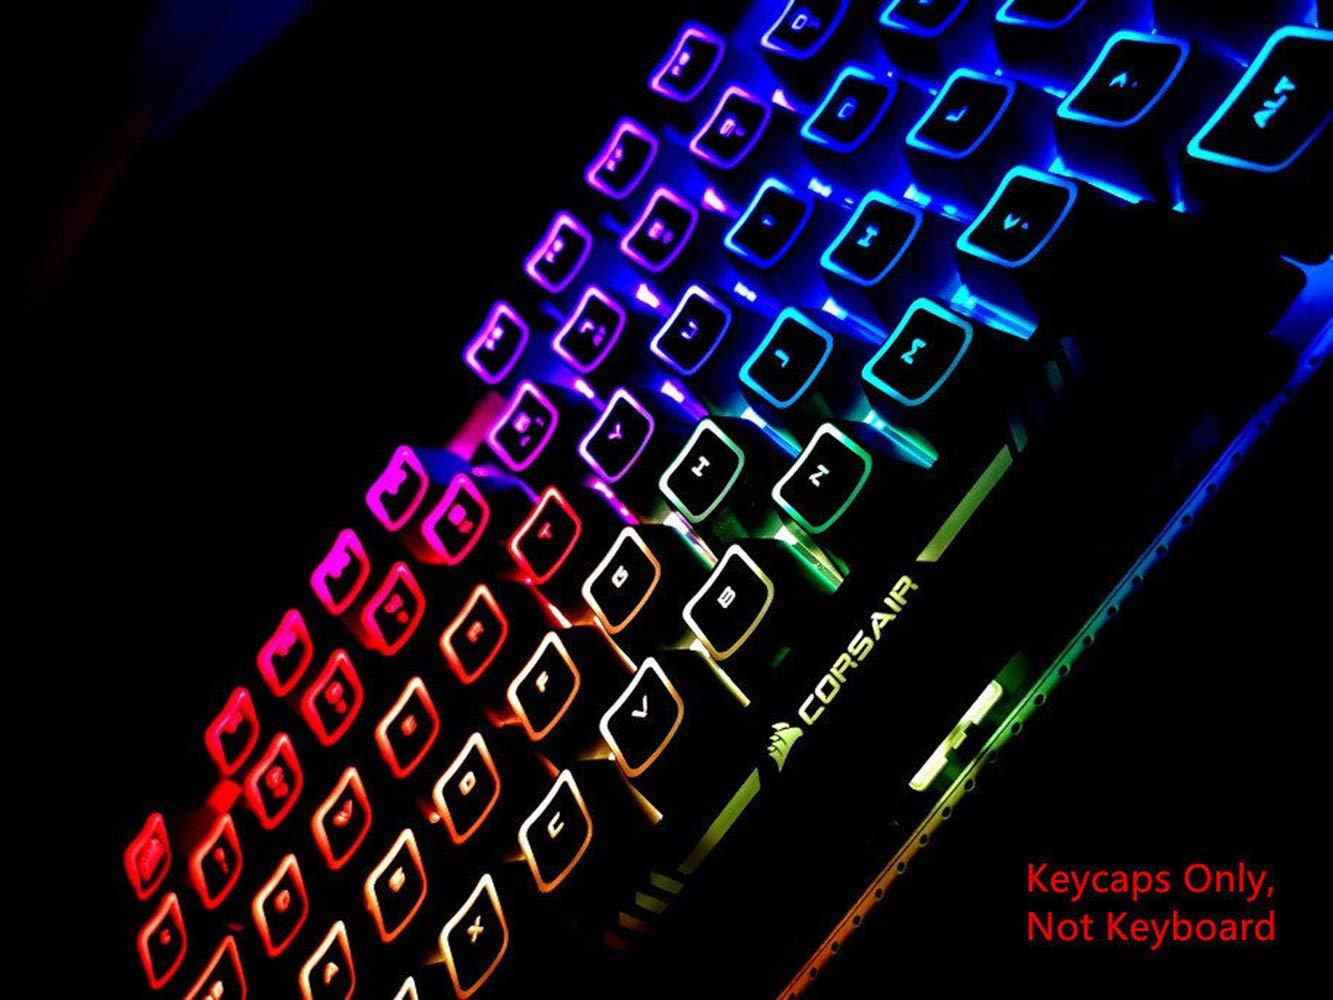 104 Keycaps RO G Style Backlit Keycap Switch for Corsair K65 K68 K70 RGB LUX K95 Platinum RGB Strafe Mechanical Keyboards Gaming